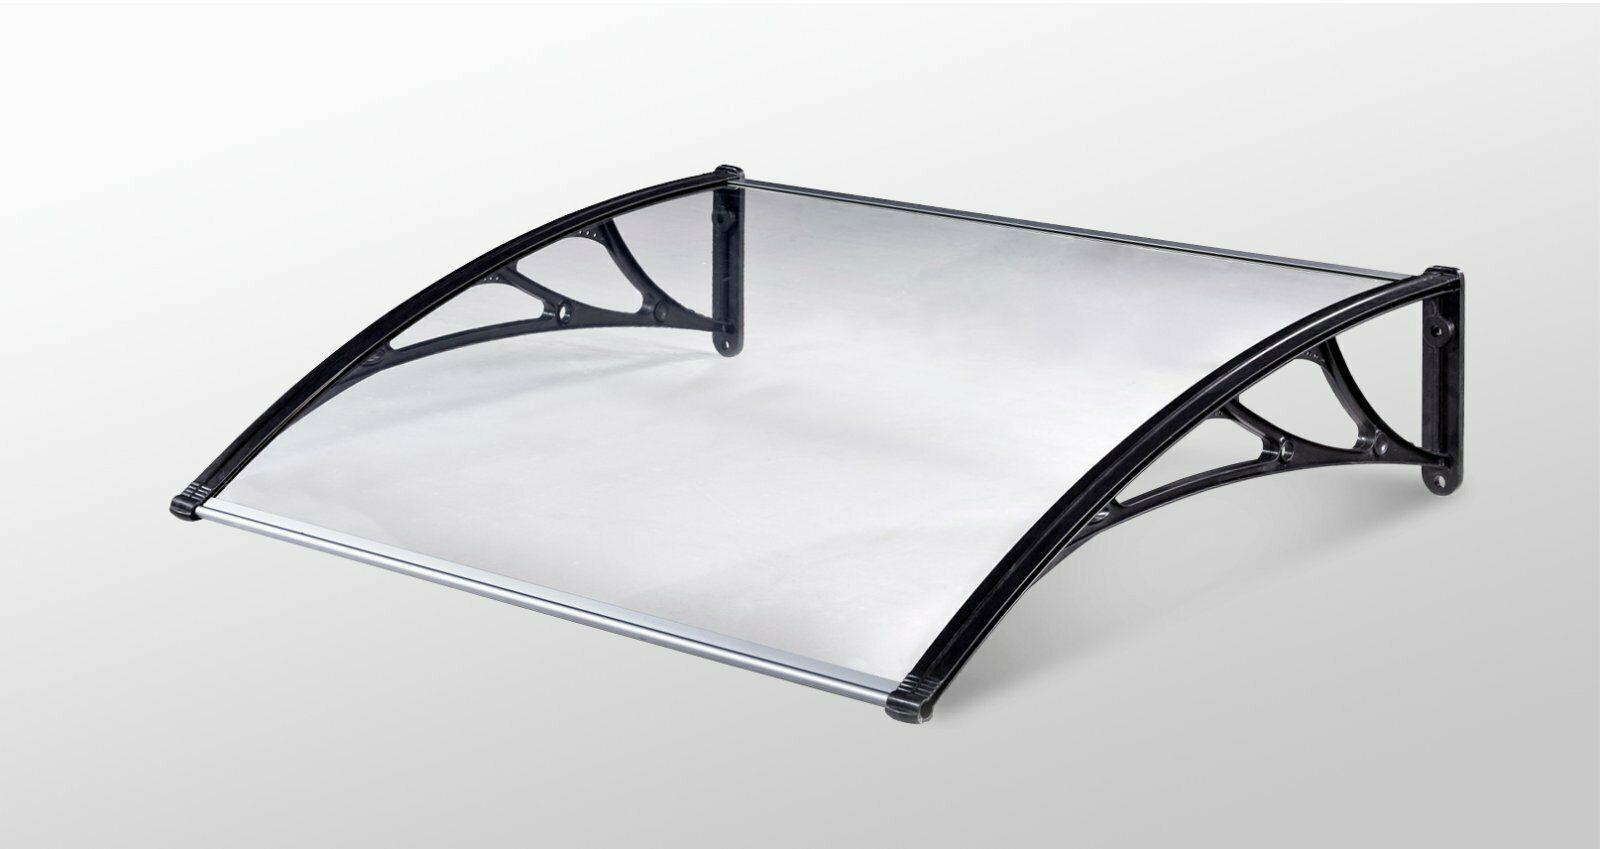 Defacto Vordach gekrümmt Tür Türvordach Haustür Polycarbonat Überdachung HxB 80x60cm DF-600C